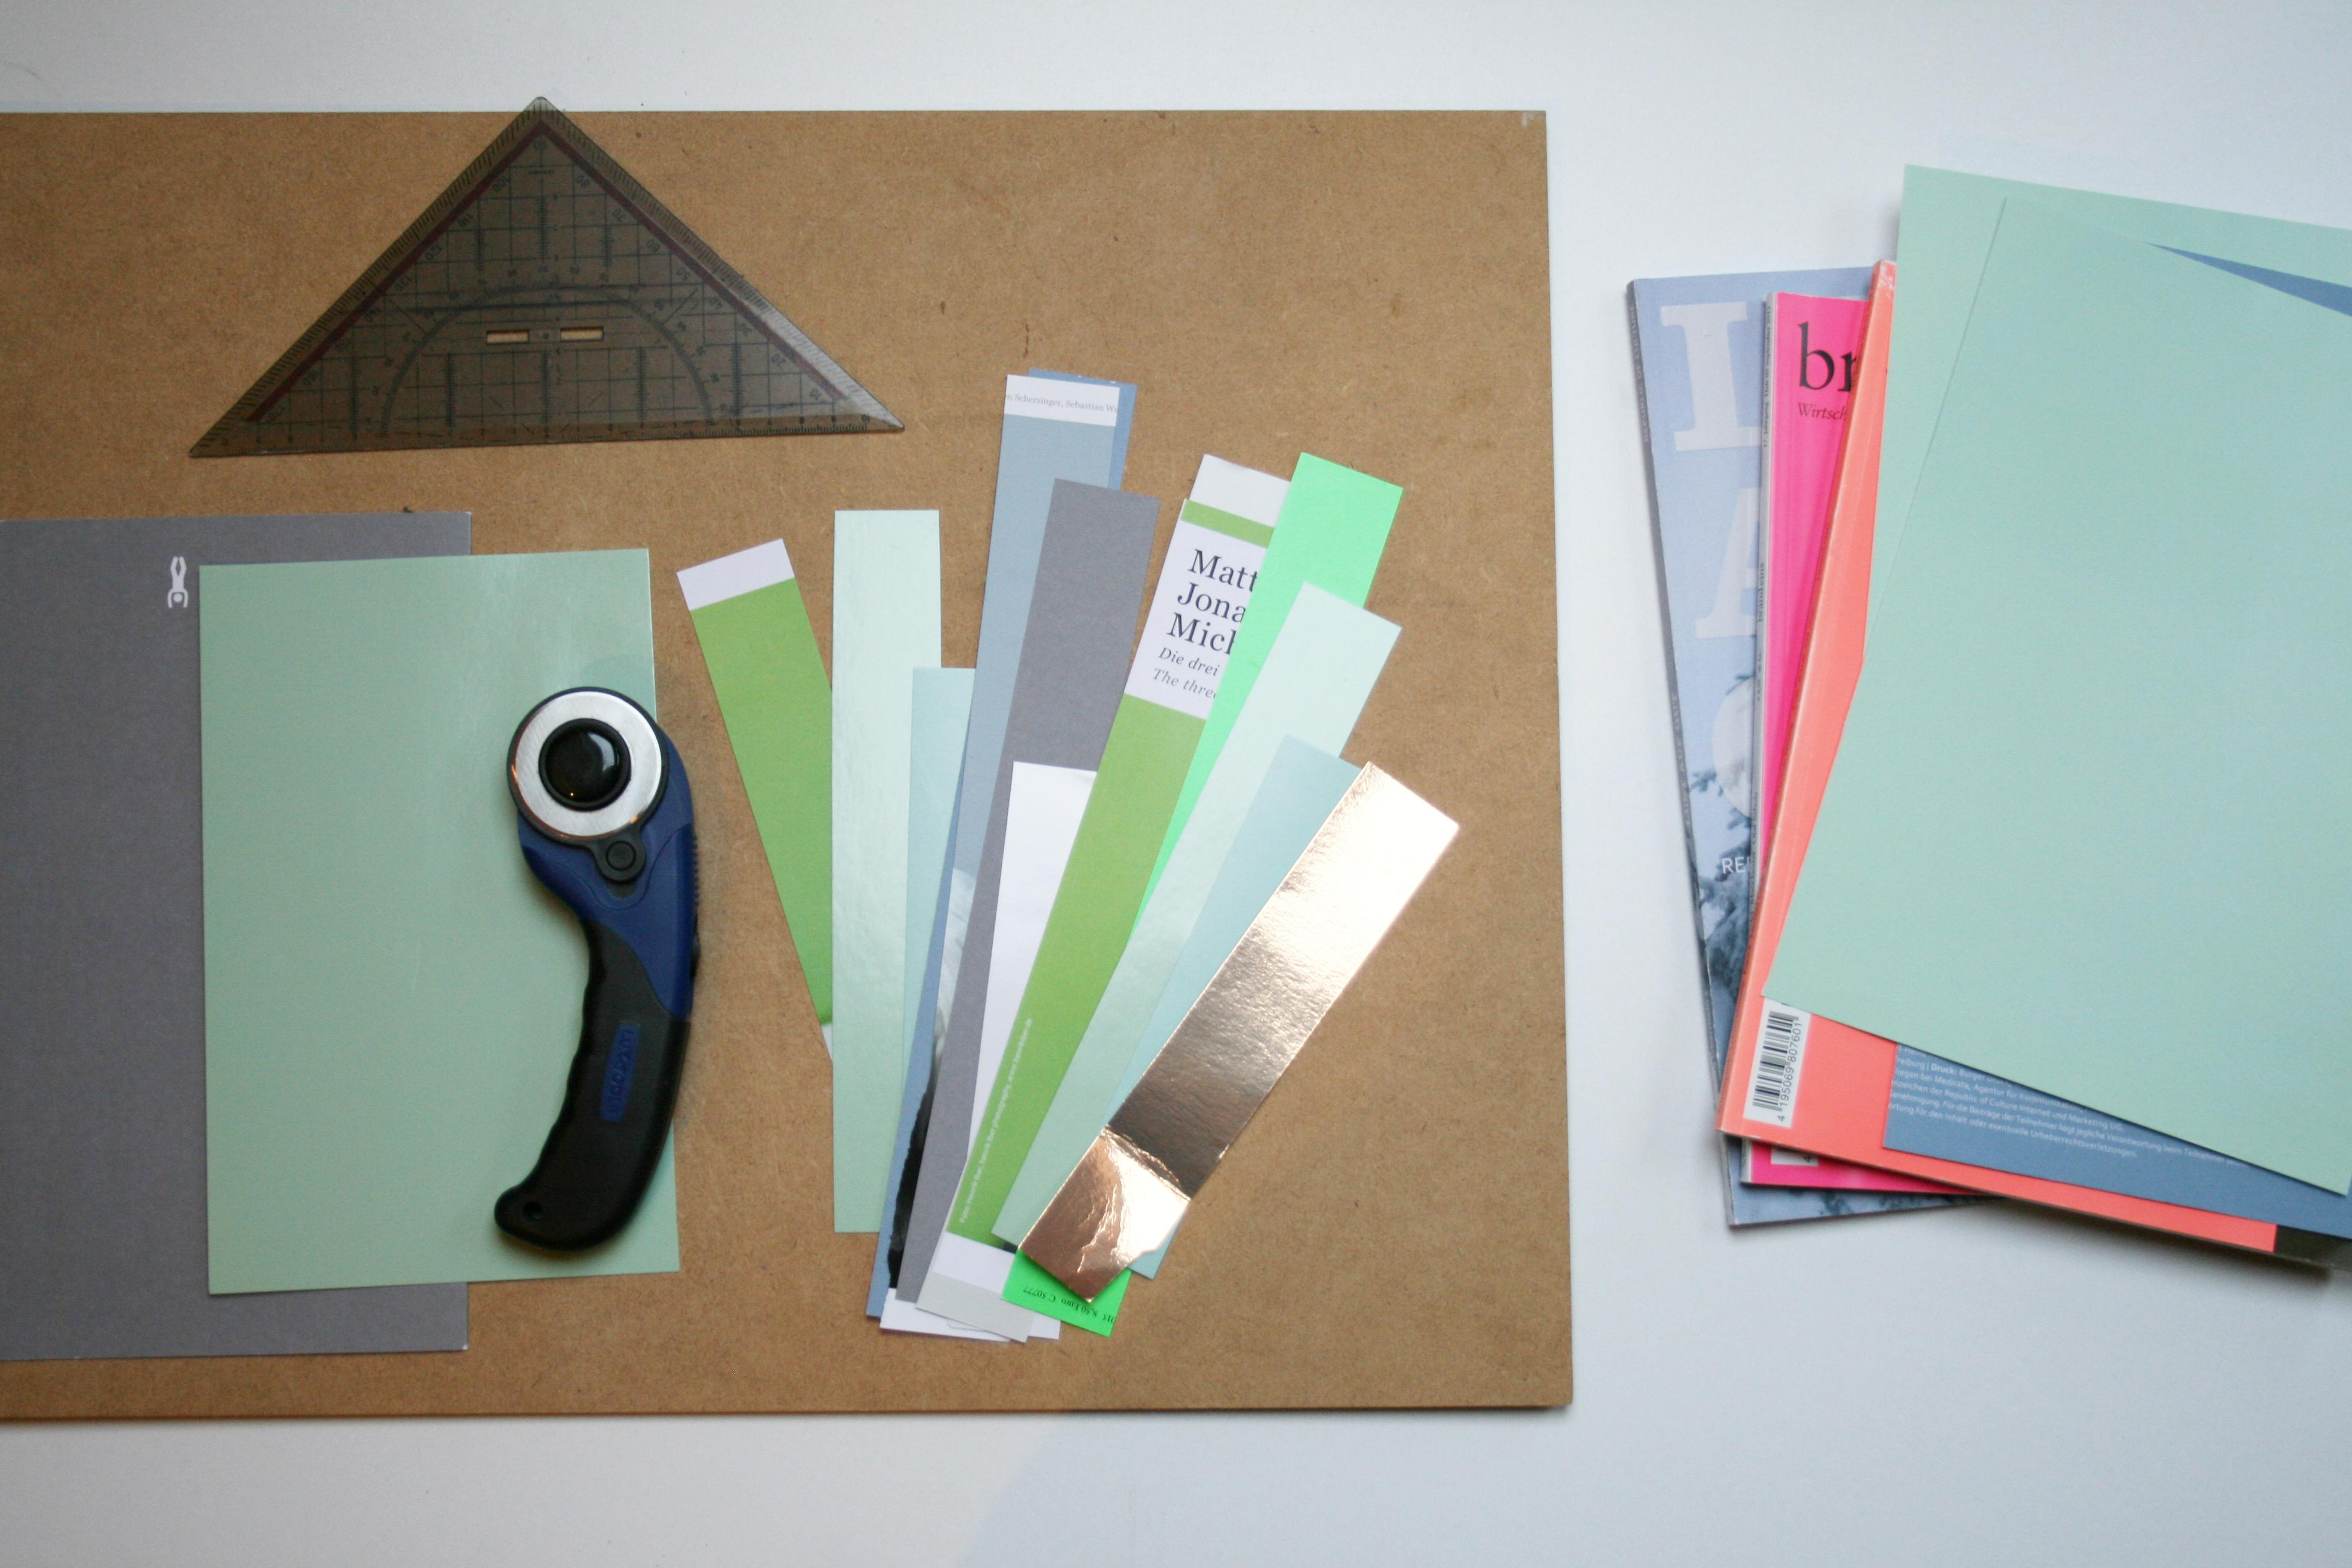 Diy geometrische collage wandgestaltung diy wandd for Wandgestaltung diy